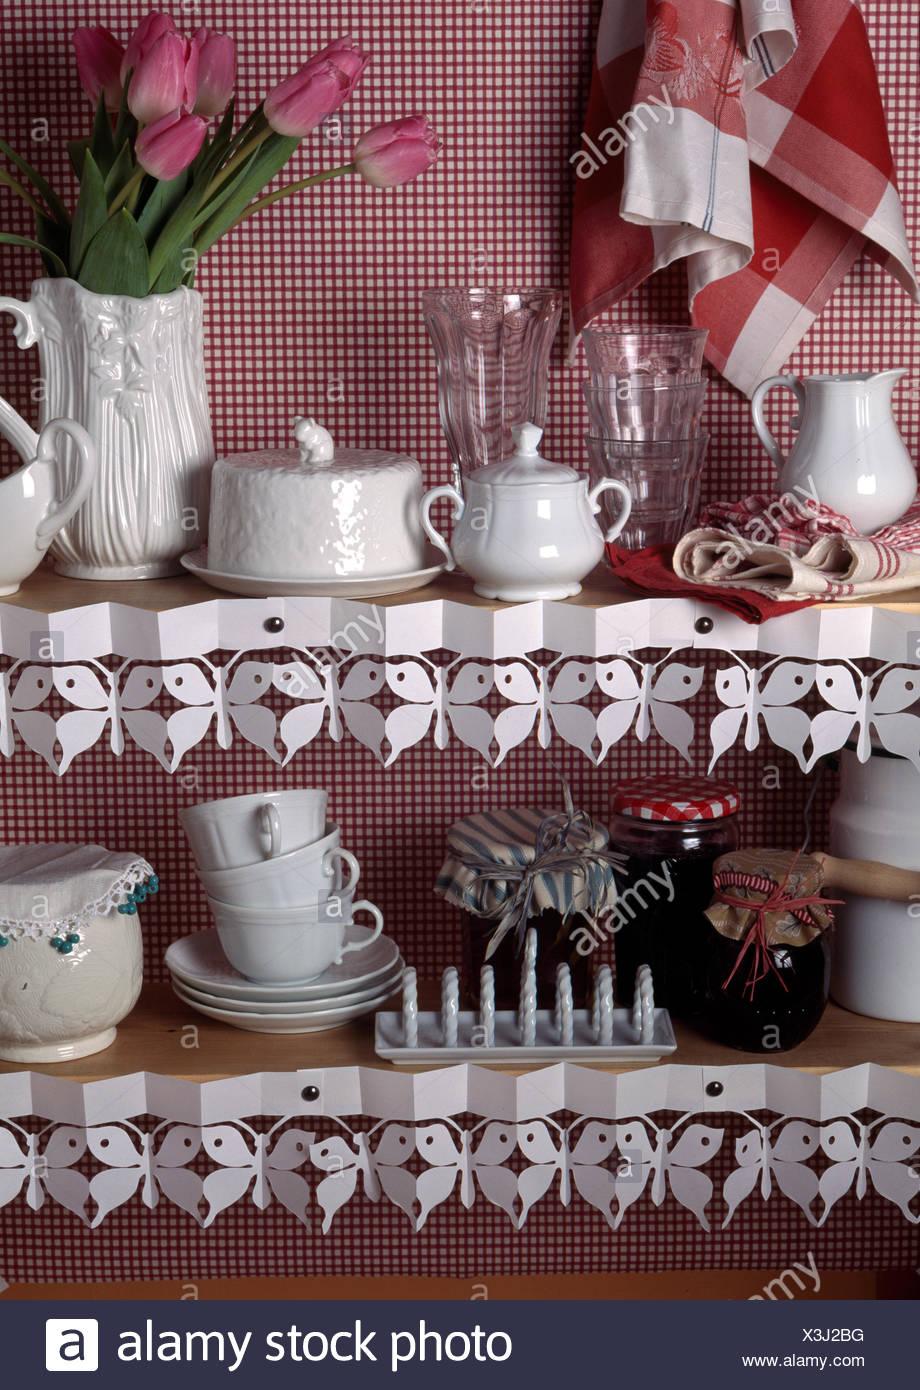 White crockery on kitchen shelves with decorative paper trim ...